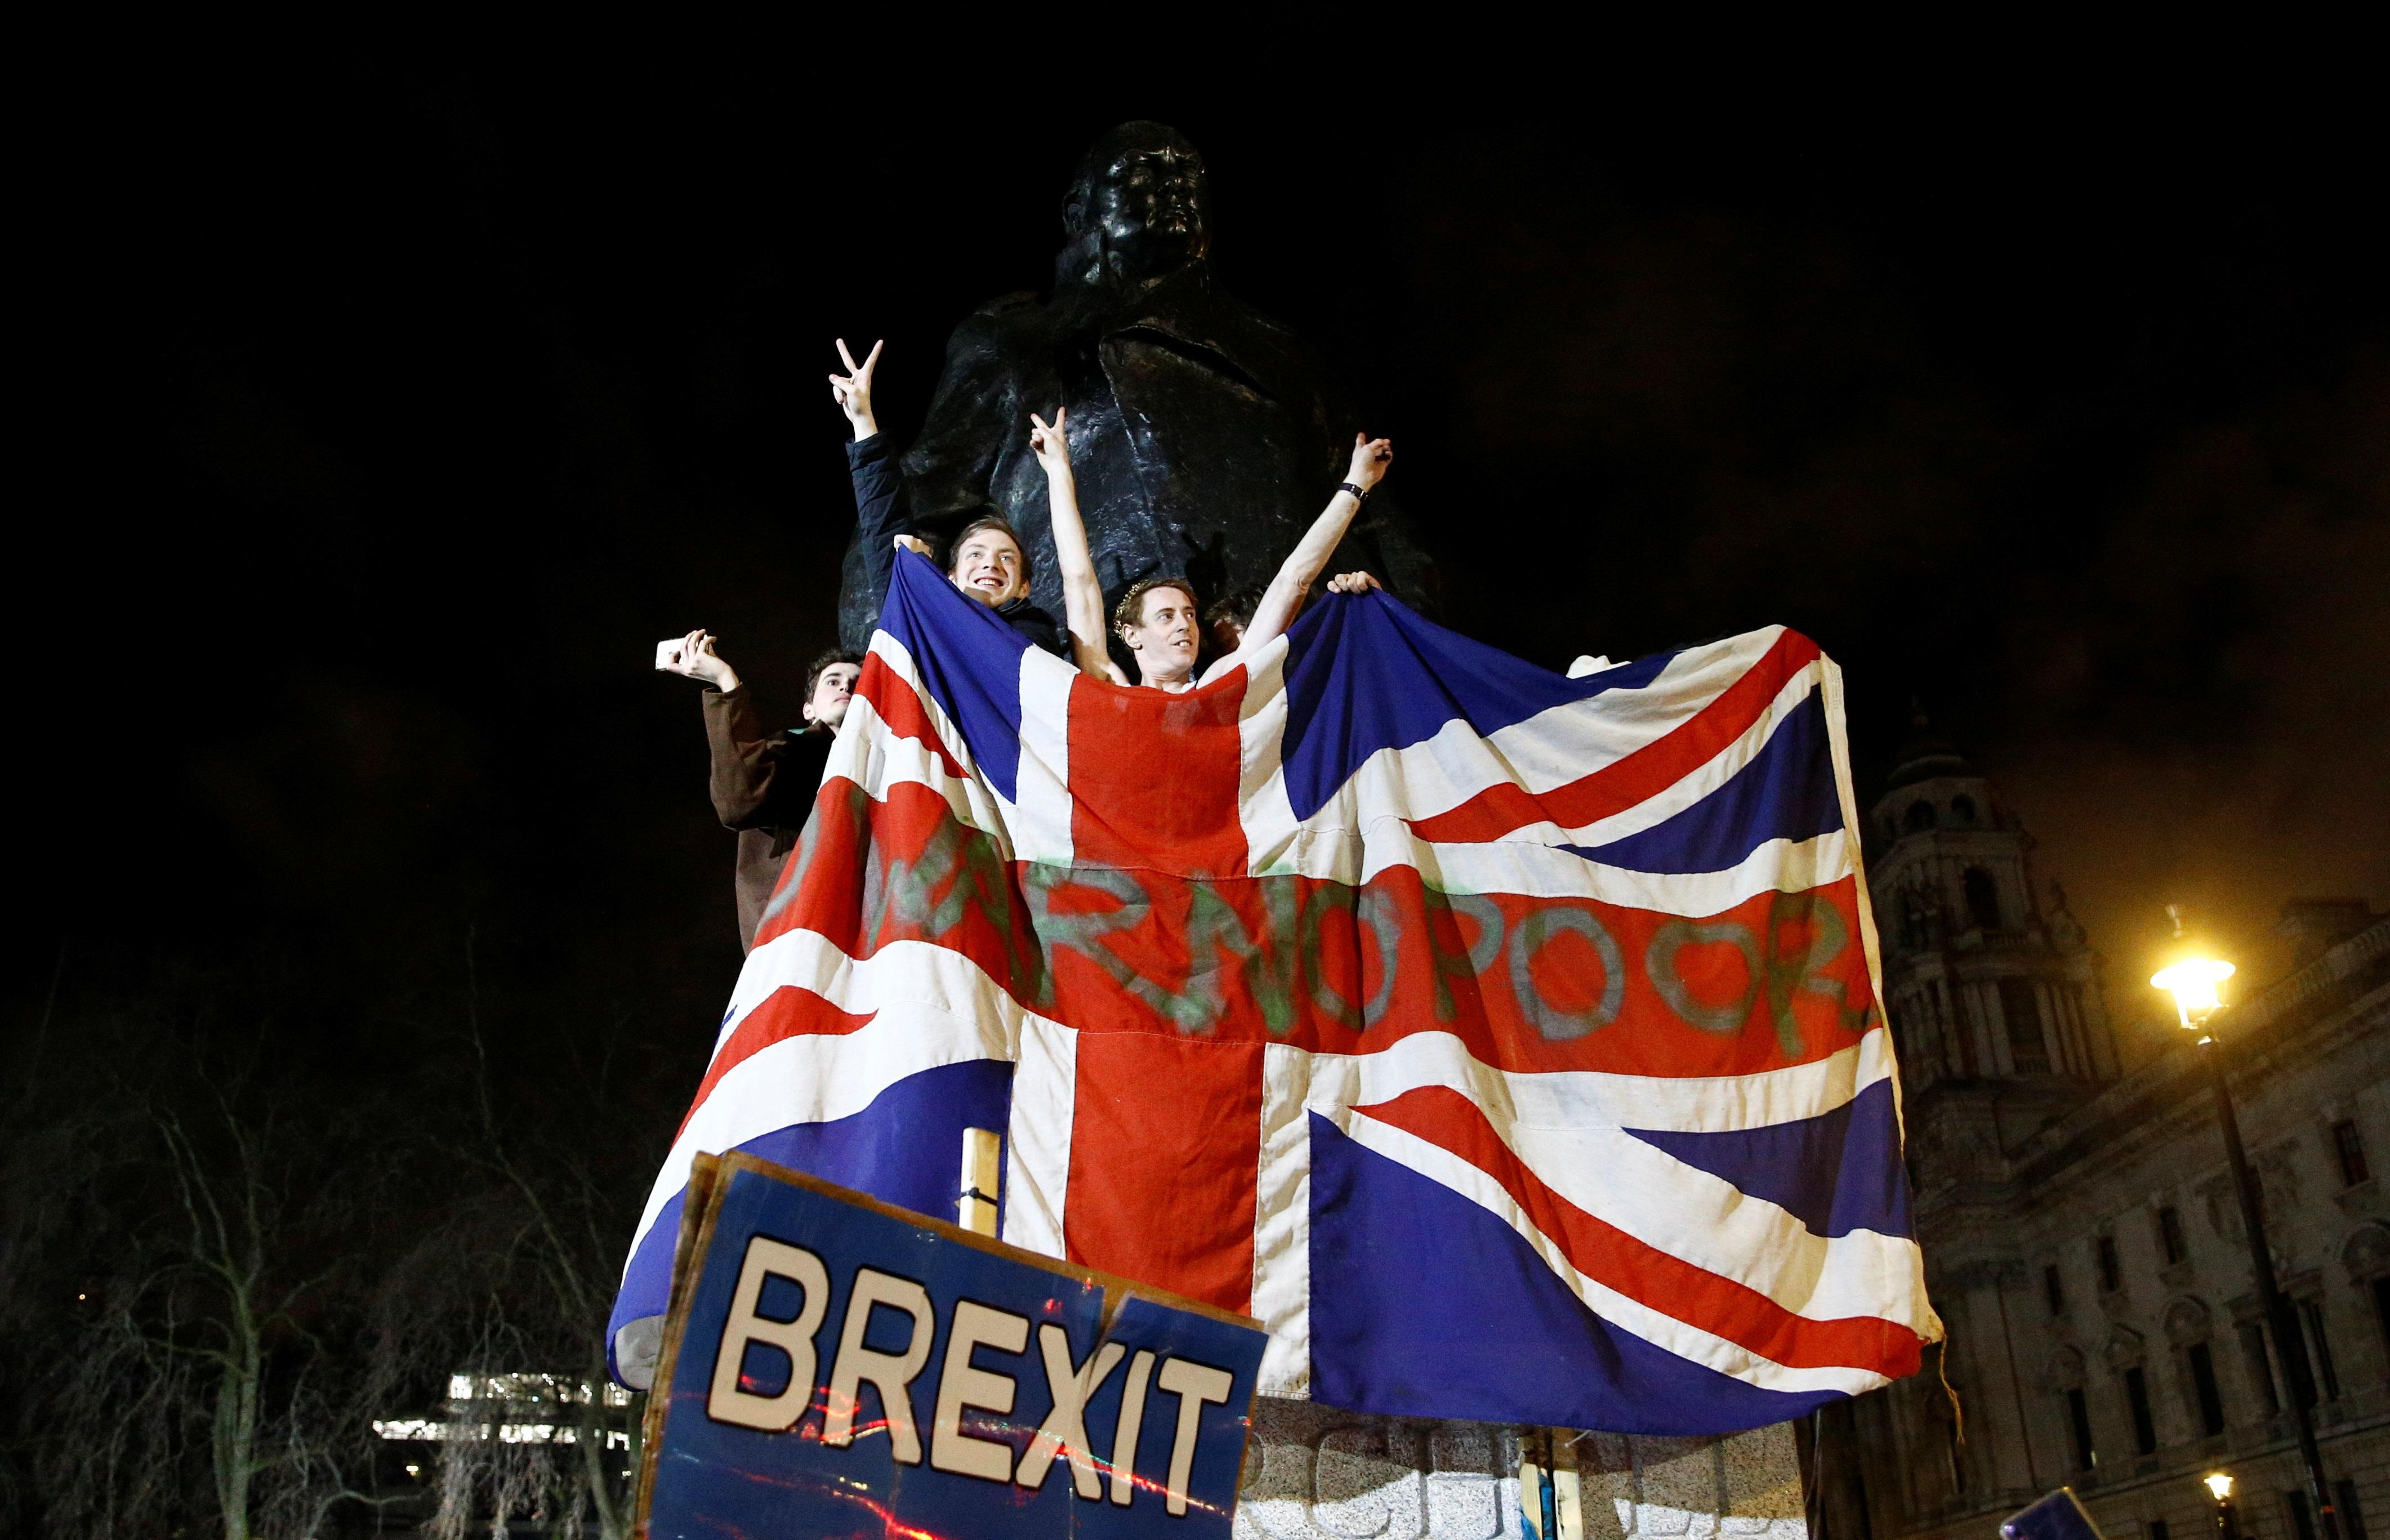 Brexit: Όλα σε μια κλωστή – Εξαιρετικά κρίσιμες συζητήσεις σήμερα για την εμπορική συμφωνία